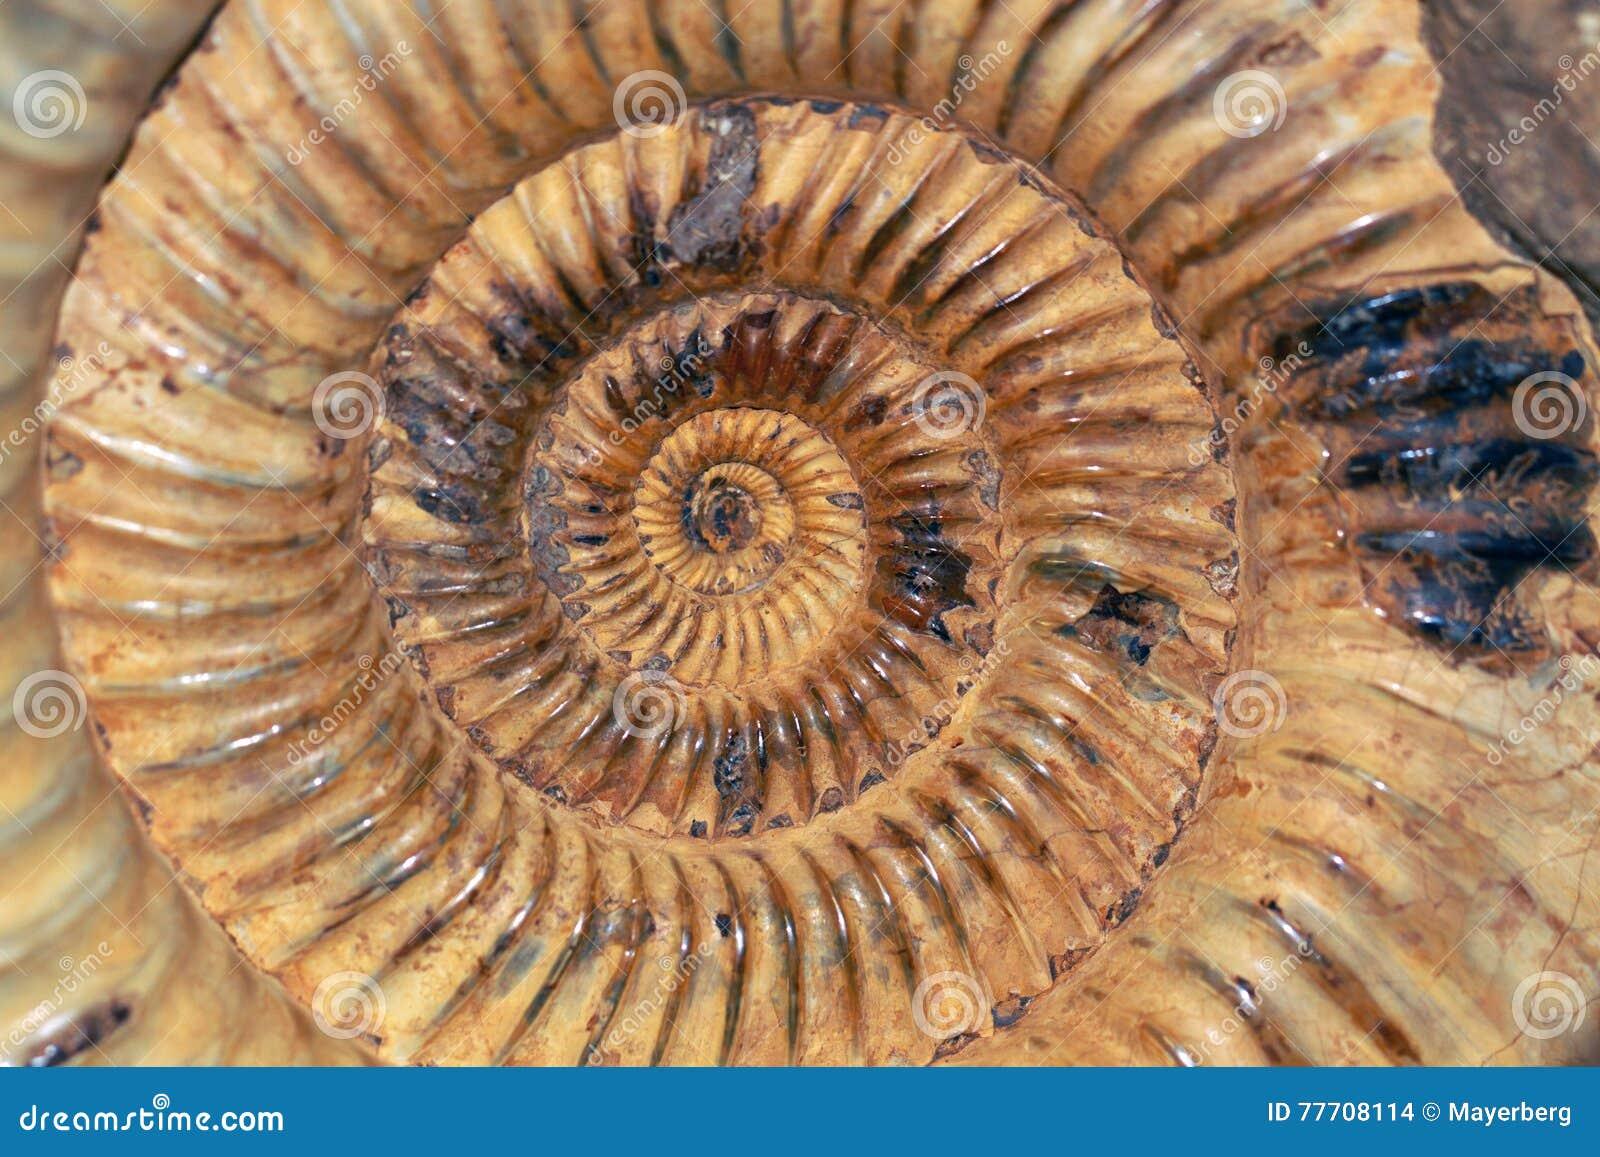 Ammonoids are an extinct group of marine mollusc animals